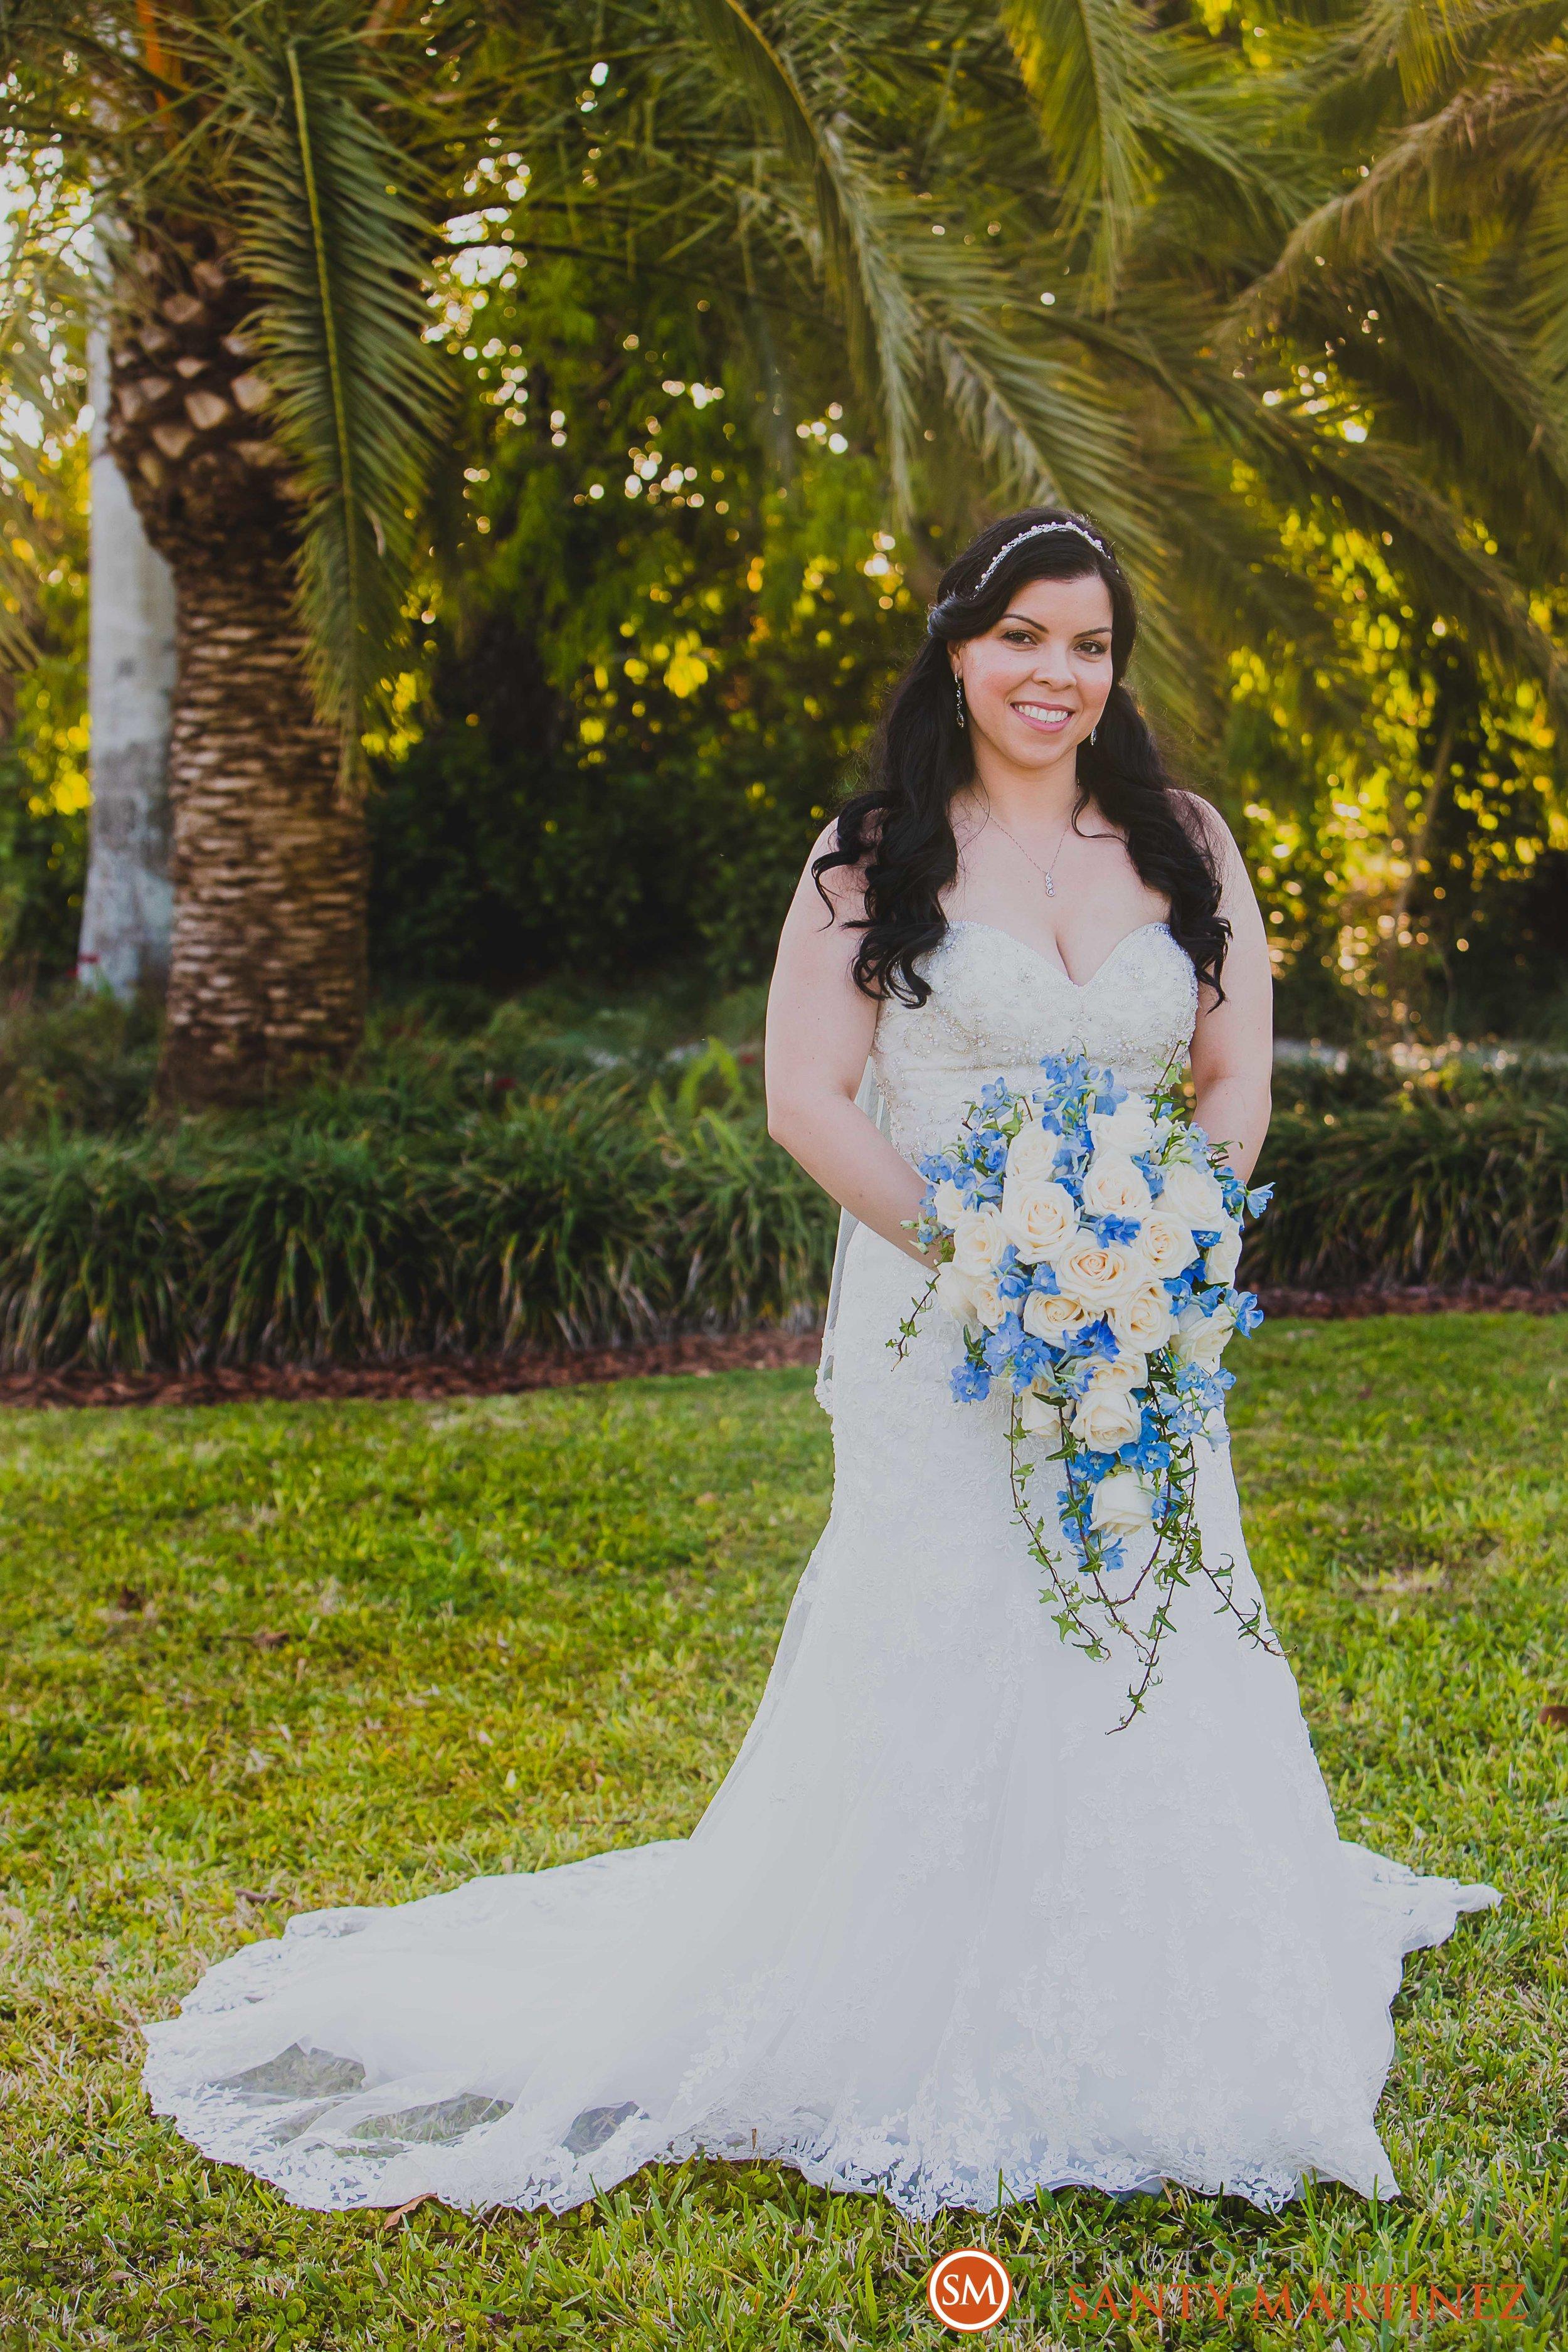 Wedding - Whimsical key West House - Photography by Santy Martinez-23.jpg